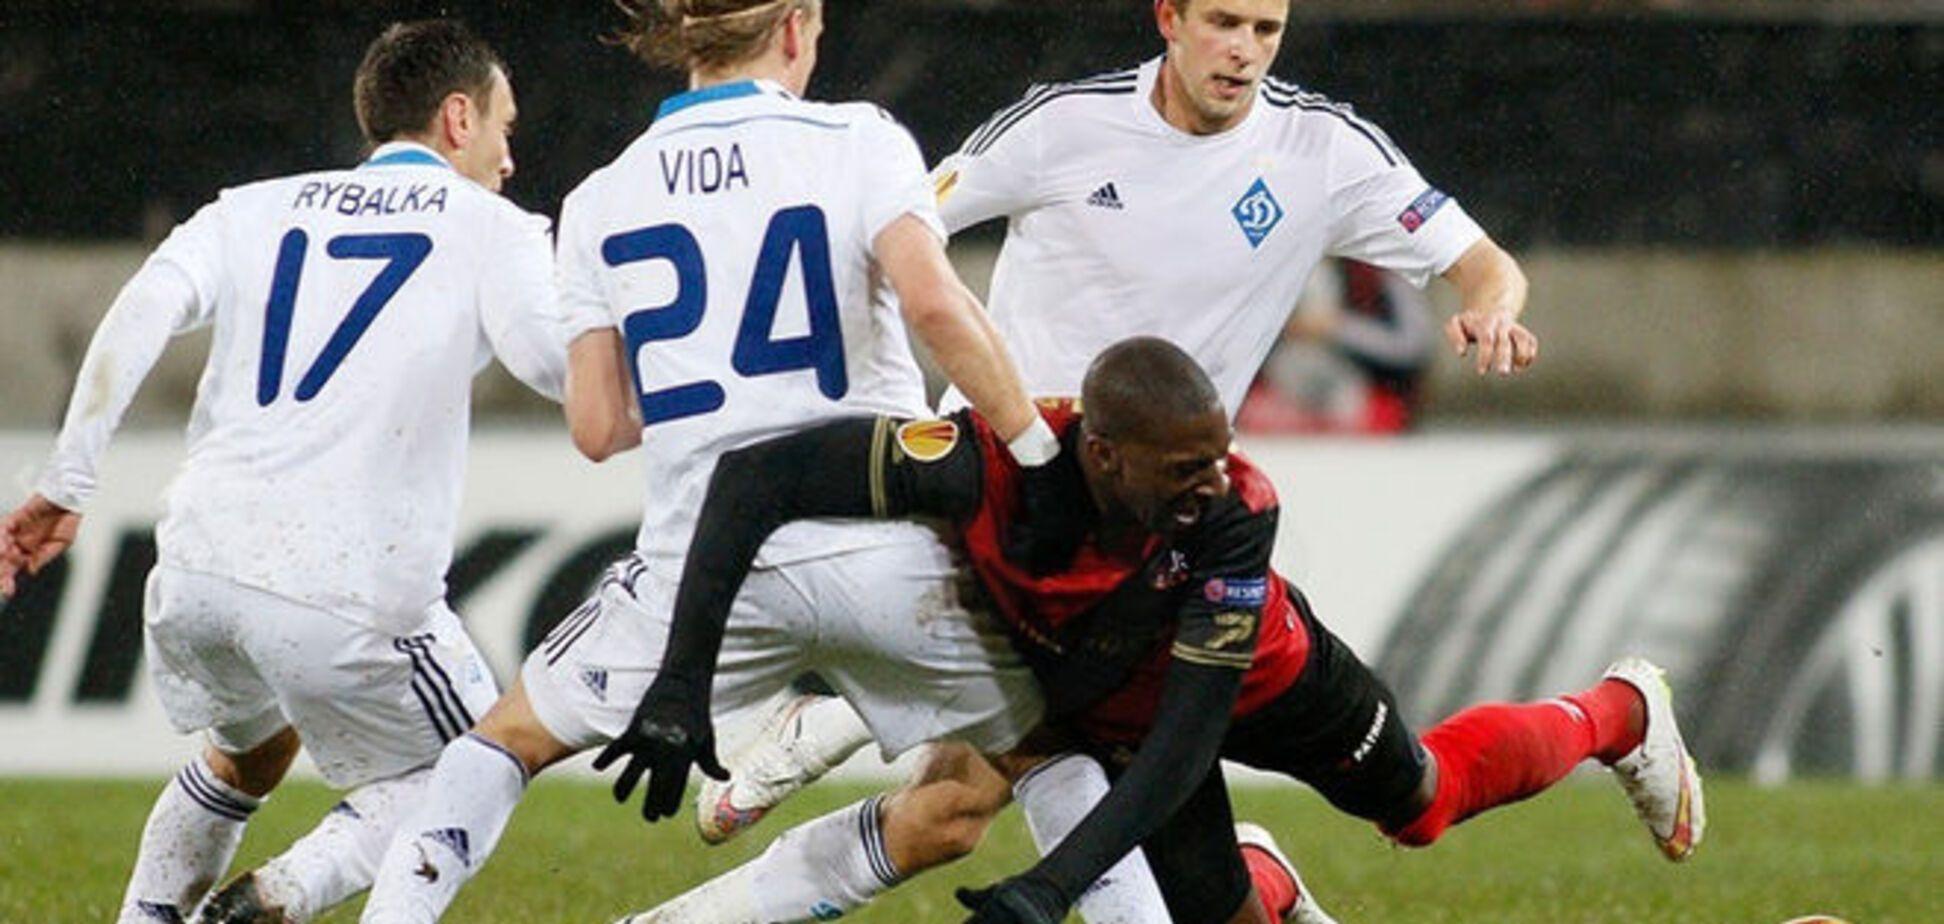 Динамо - Генгам: прогноз экспертов